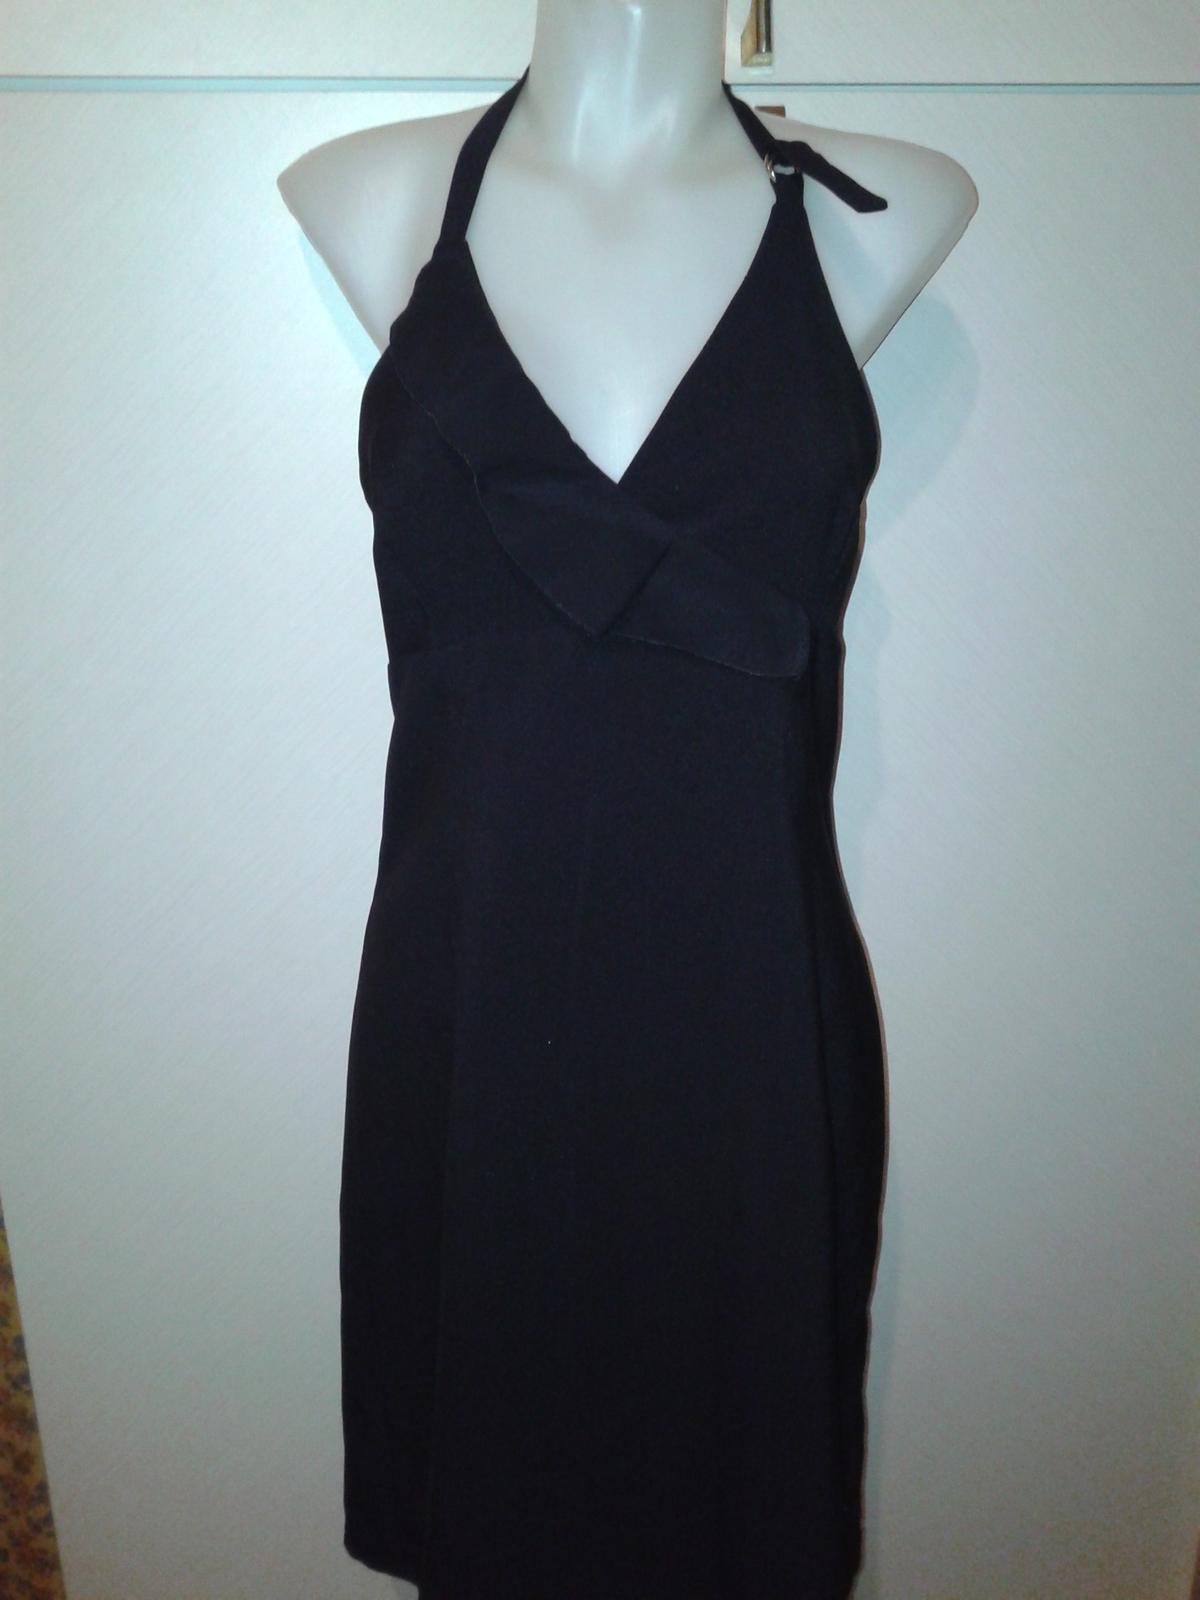 čierne spoločenské šaty s volánom Tally Weijl36/38 - Obrázok č. 3